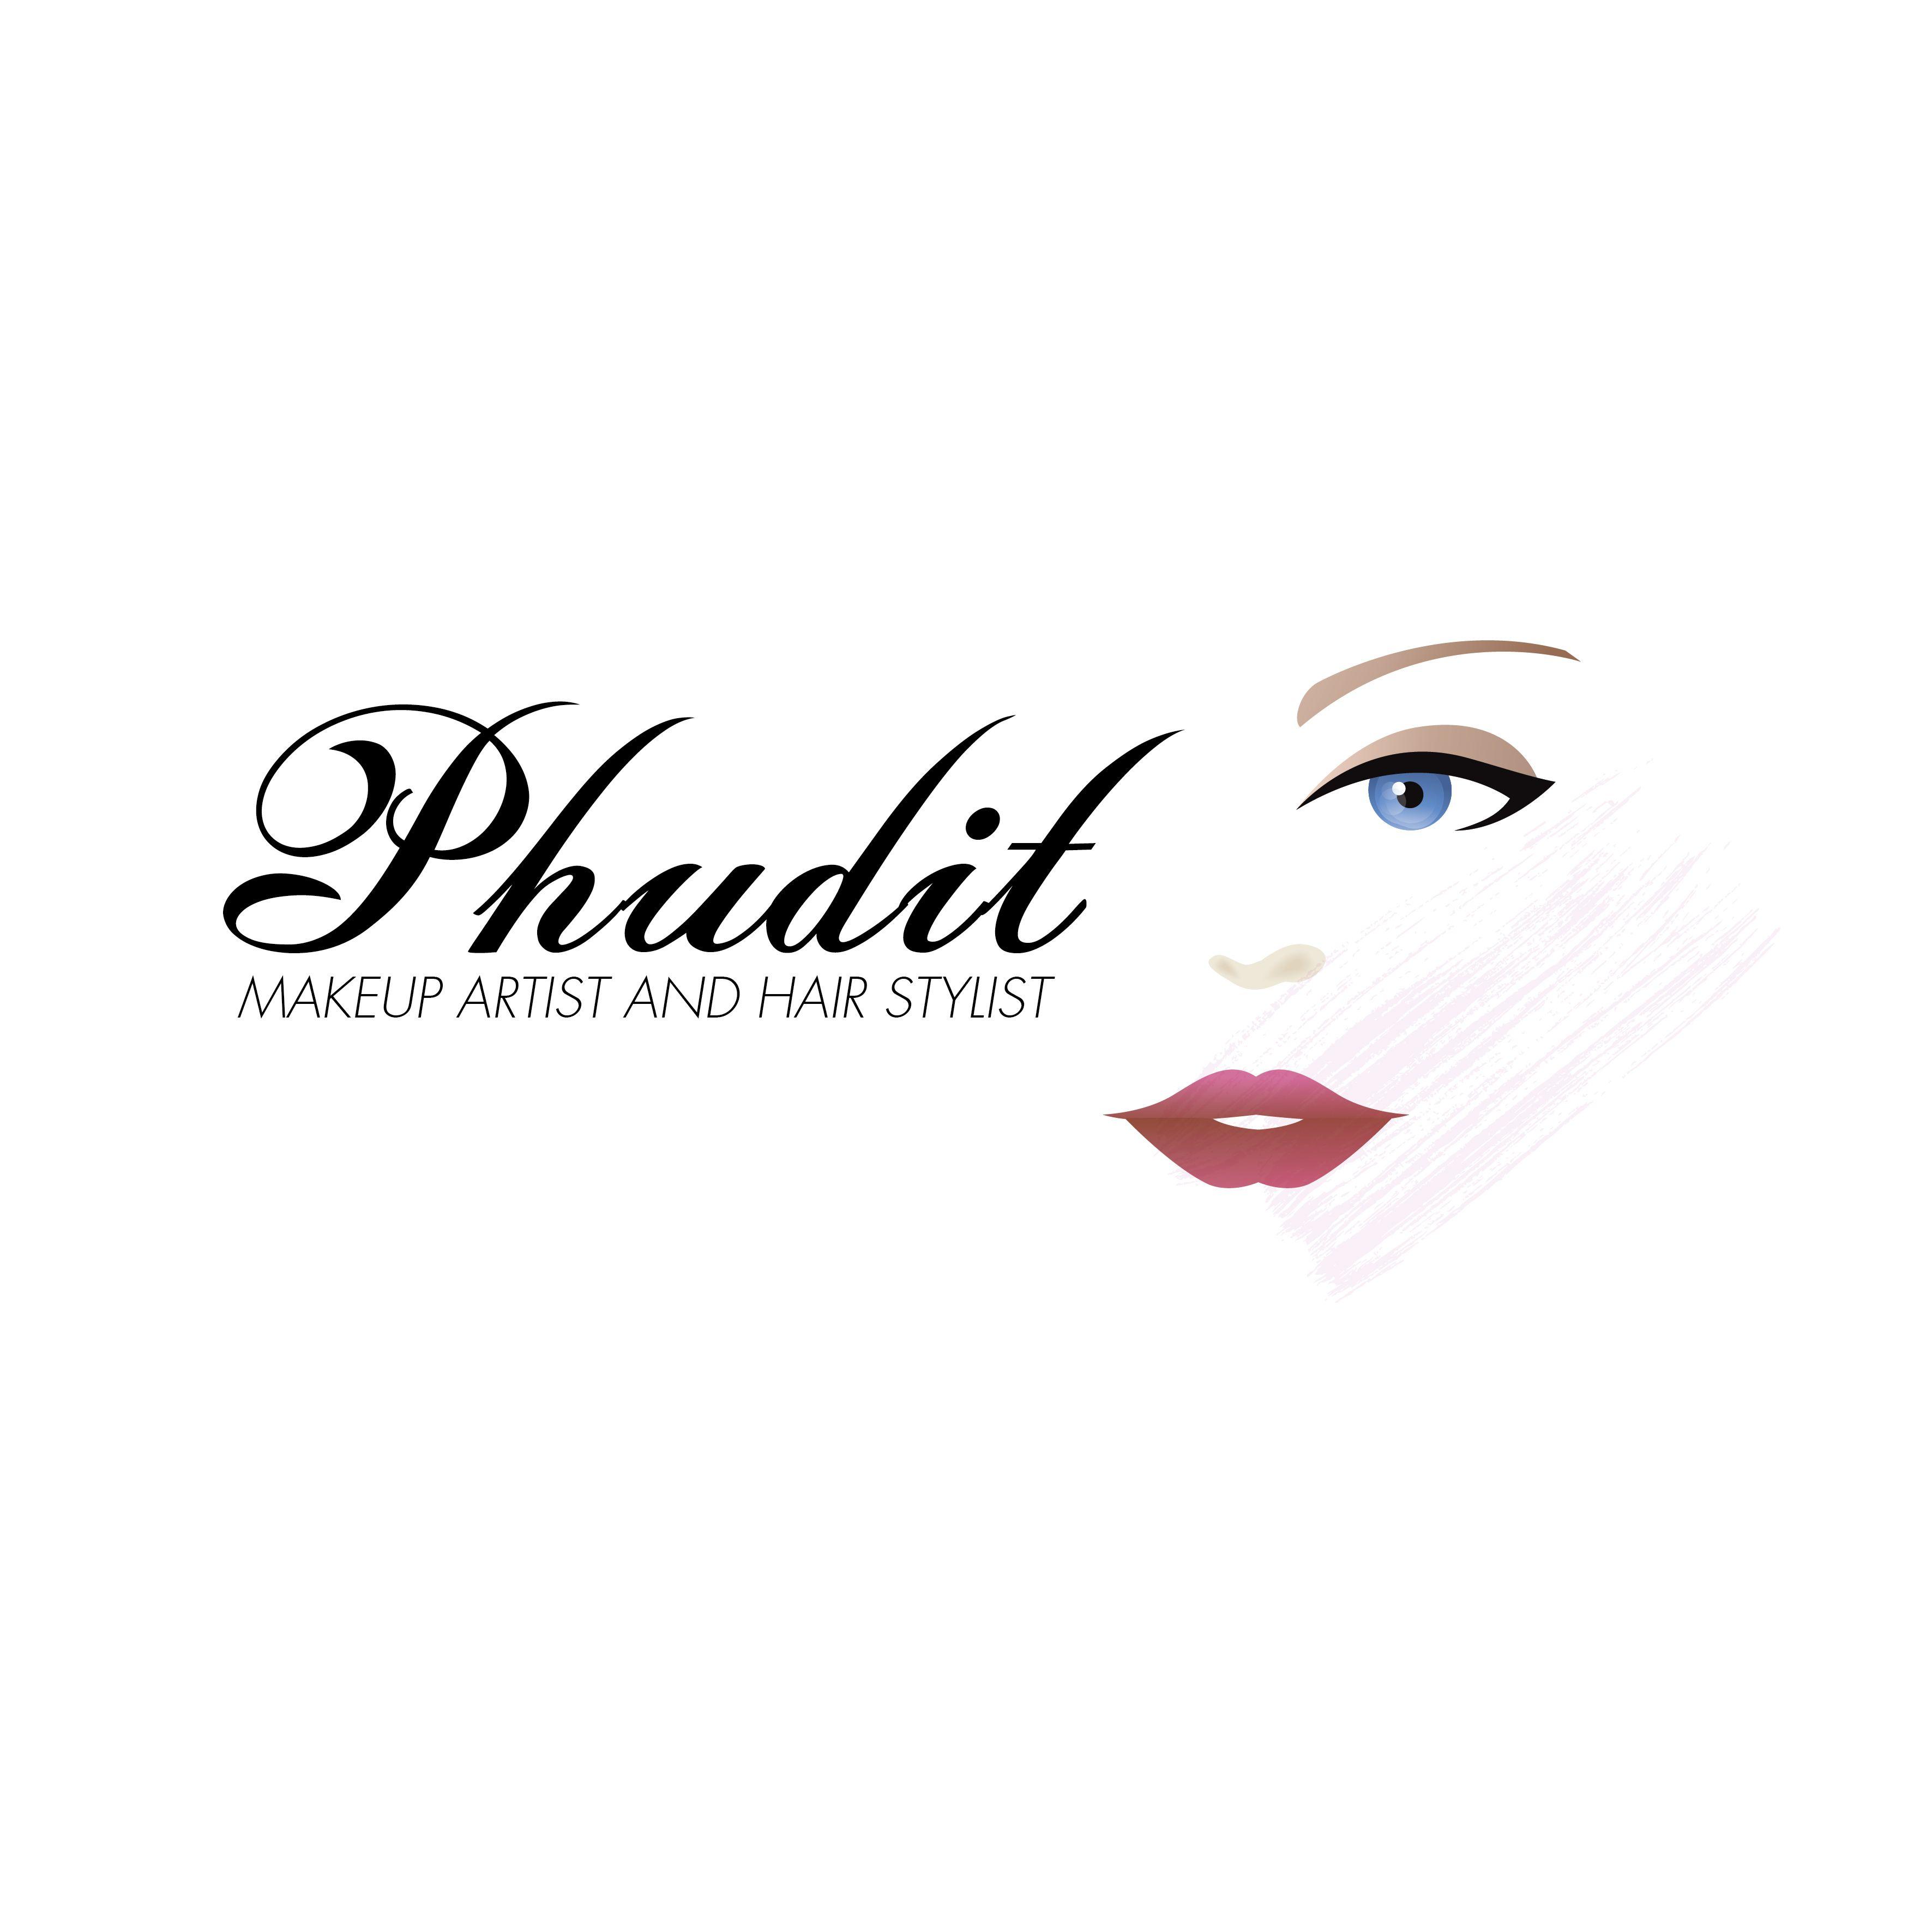 PhuditMakeupArtistLogo04.jpg (3543×3543) logo